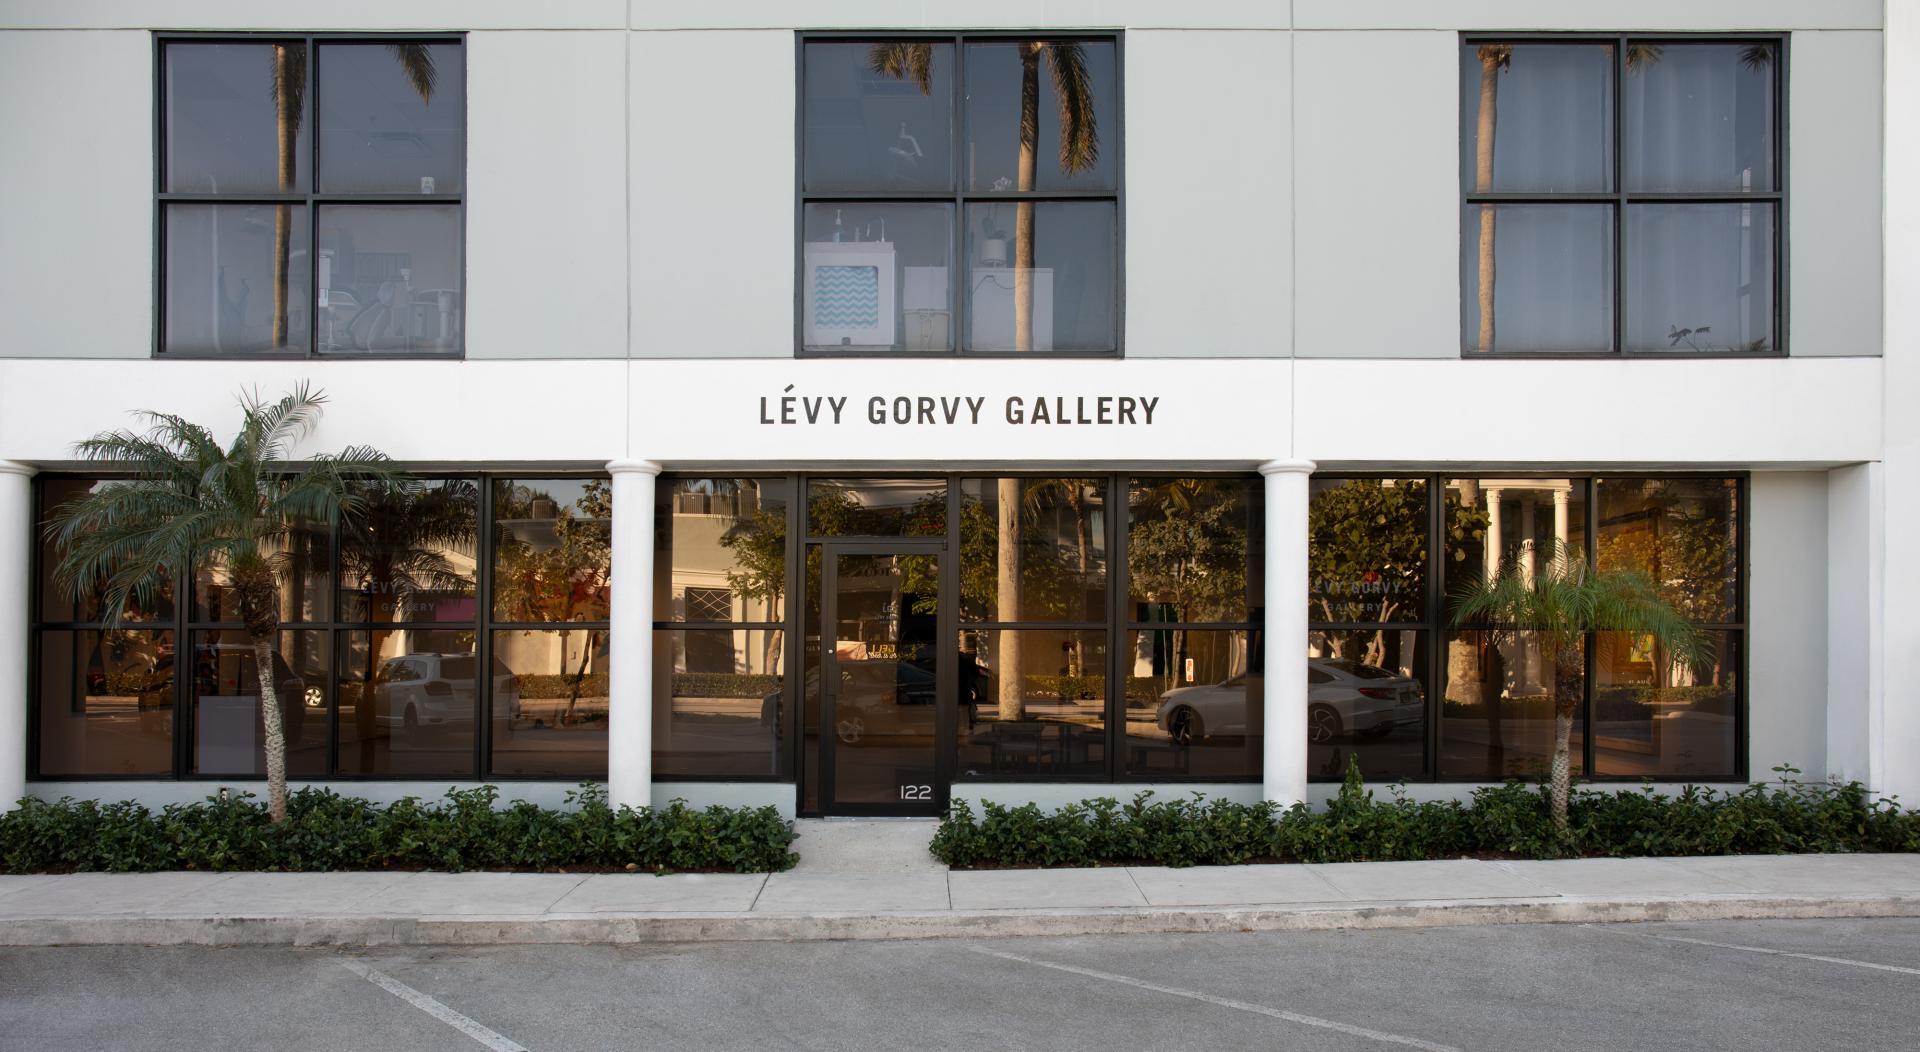 The exterior of Lévy Gorvy gallery in the Royal Poinciana Plaza, Palm Beach. Photo: Oriol Tarridas